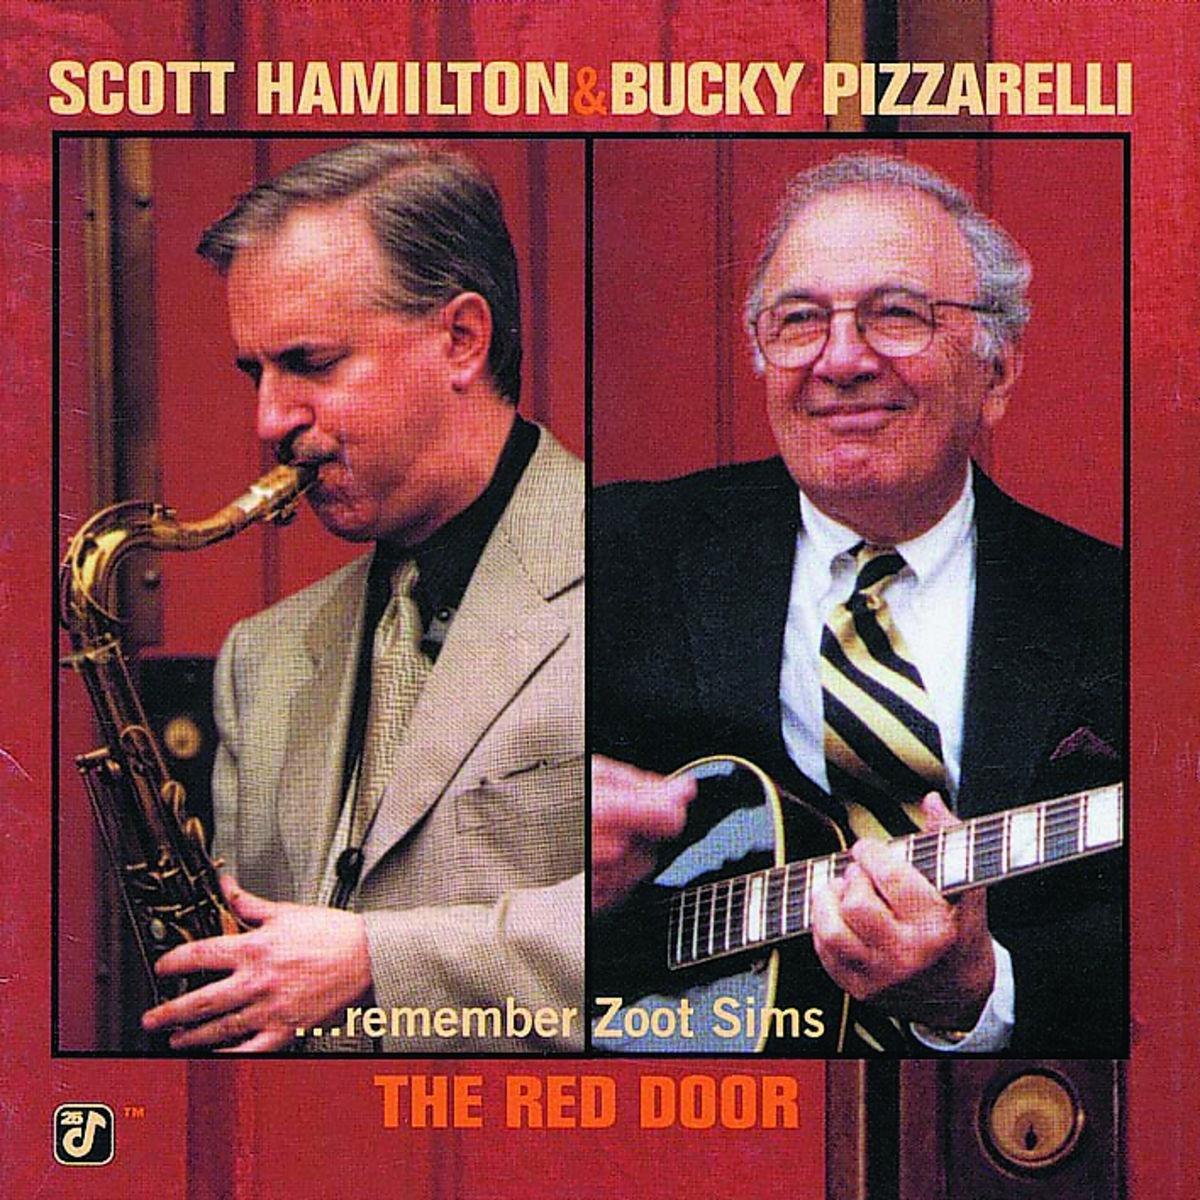 Scott Hamilton Bucky Pizzarelli - The Red Door (...Remember Zoot Sims) - Amazon.com Music  sc 1 st  Amazon.com & Scott Hamilton Bucky Pizzarelli - The Red Door (...Remember Zoot ...